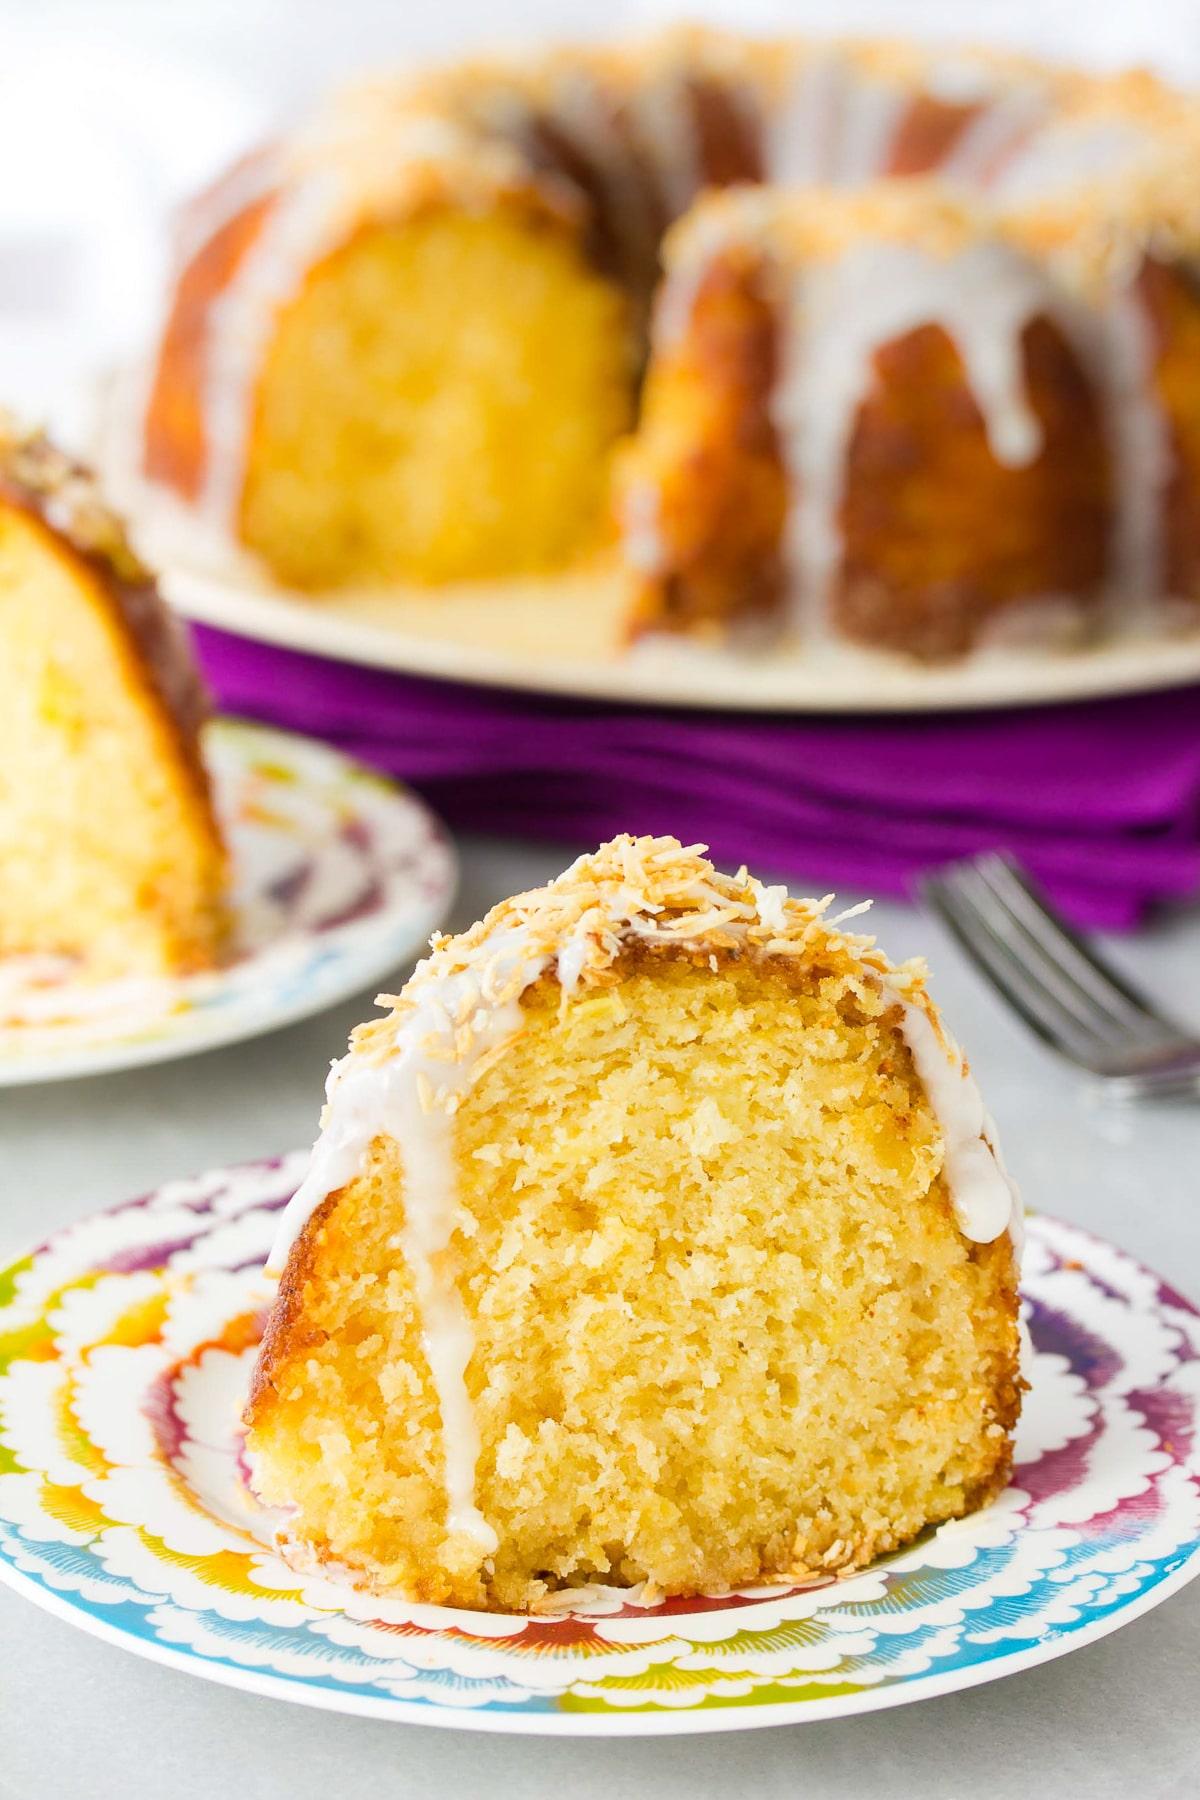 Caribbean Spiced Rum Cake Recipe #ASpicyPerspective #bundtcake #spicecake #rum #rumcake #caribbean #holiday #coconut #pineapple